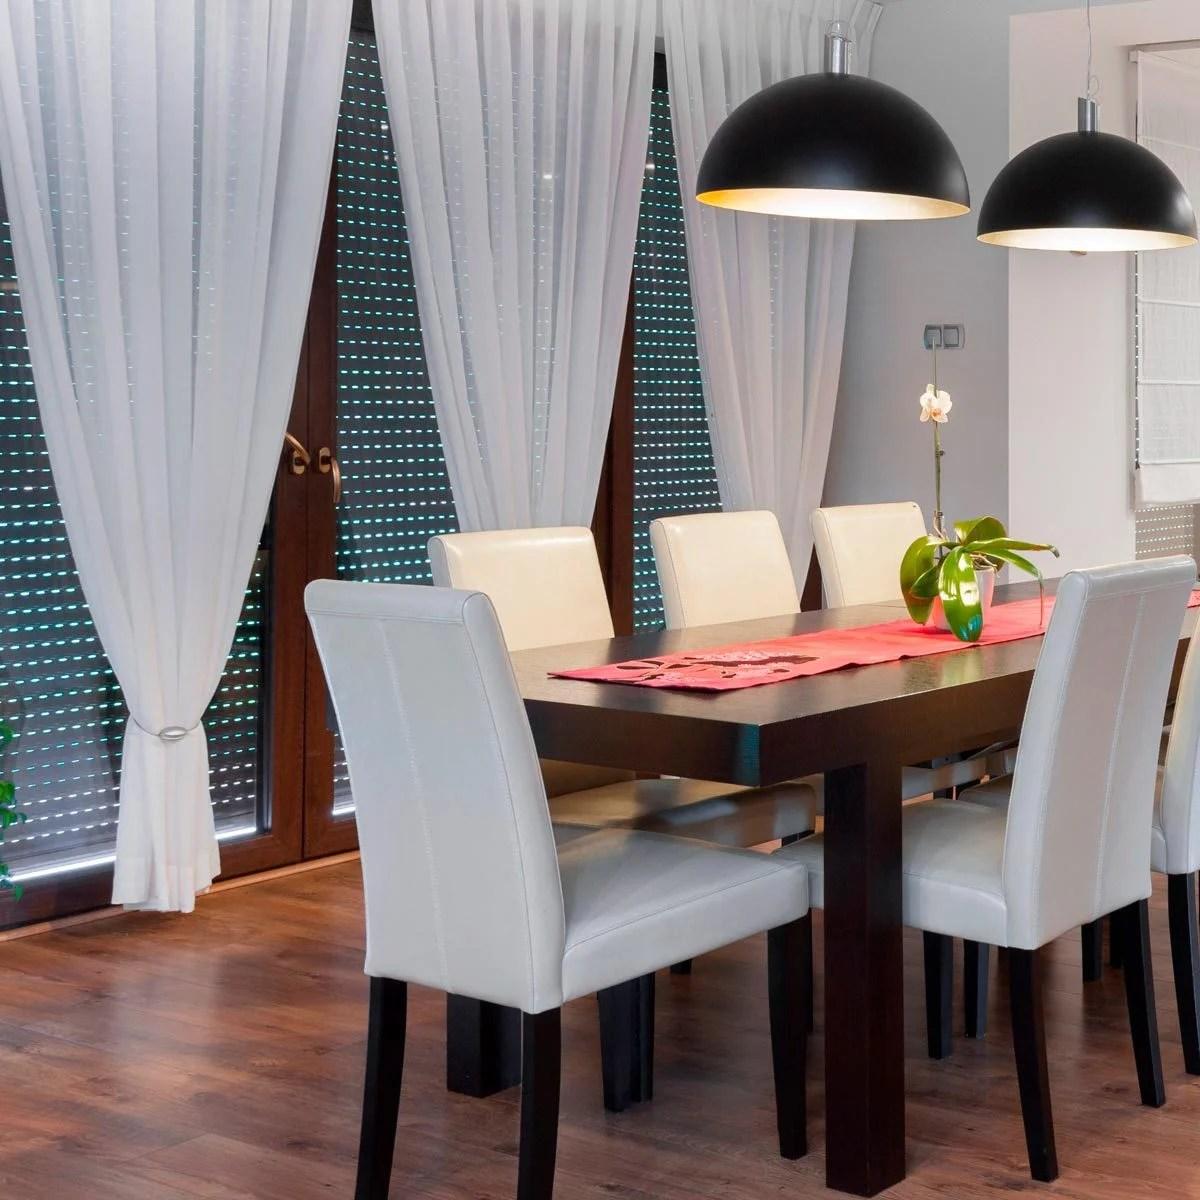 Stylish Dining Room Curtain Ideas | Family Handyman on Dining Room Curtain Ideas  id=53045